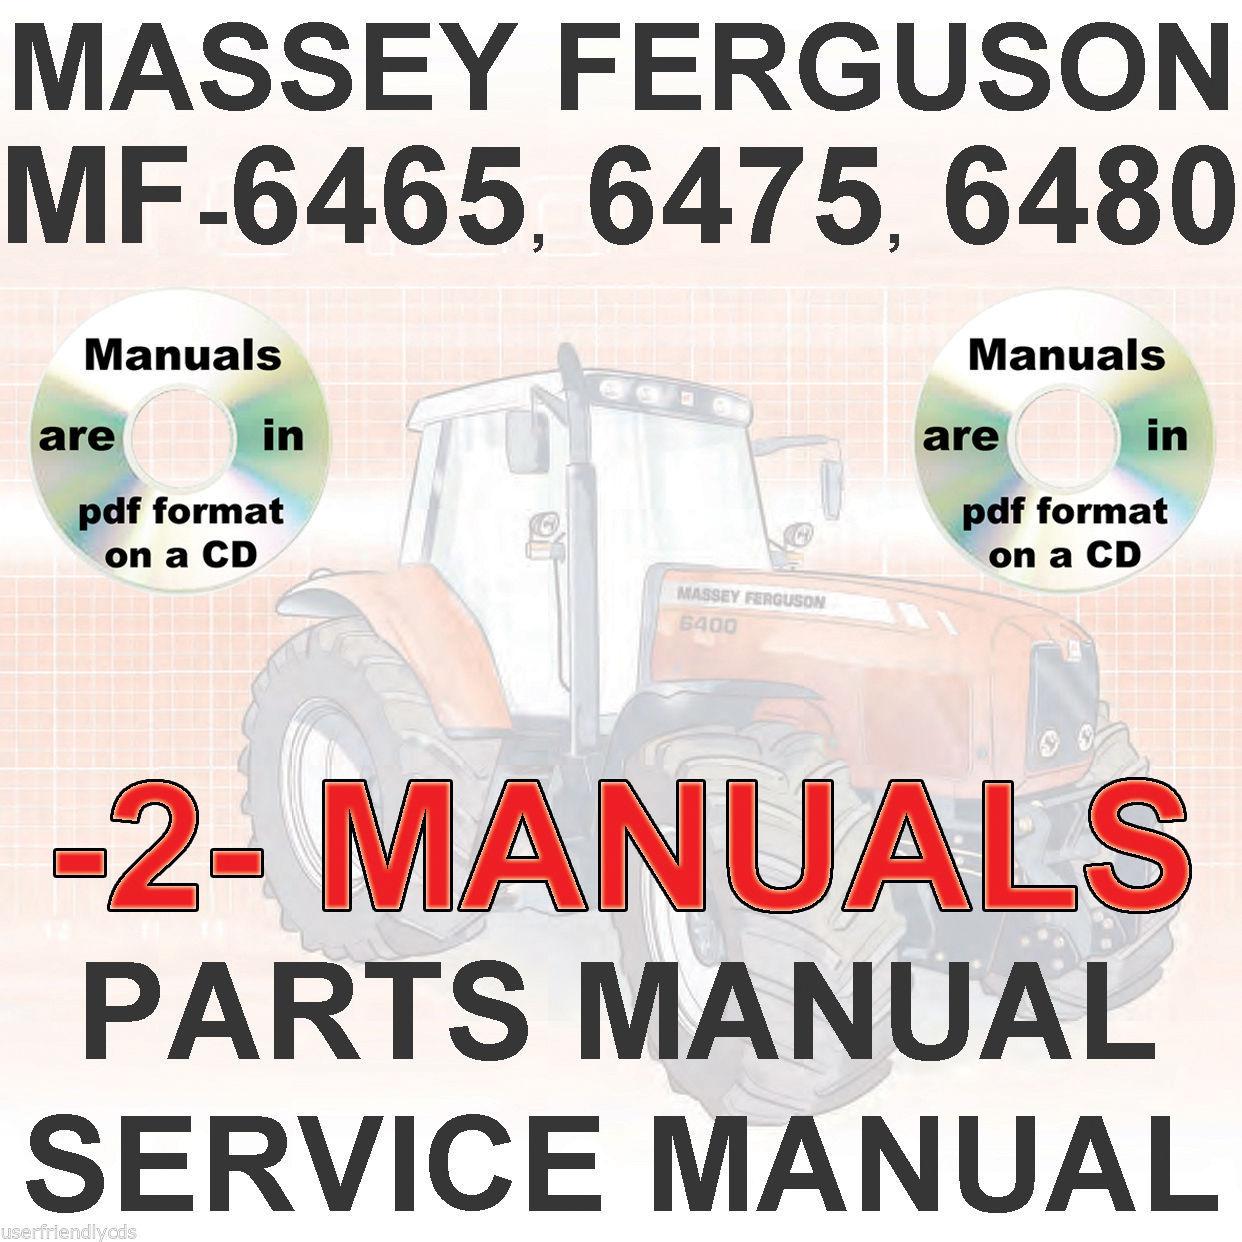 Massey Ferguson MF6465 MF 6465 Tractor SERVICE & PARTS Manual -2- MANUALS CD